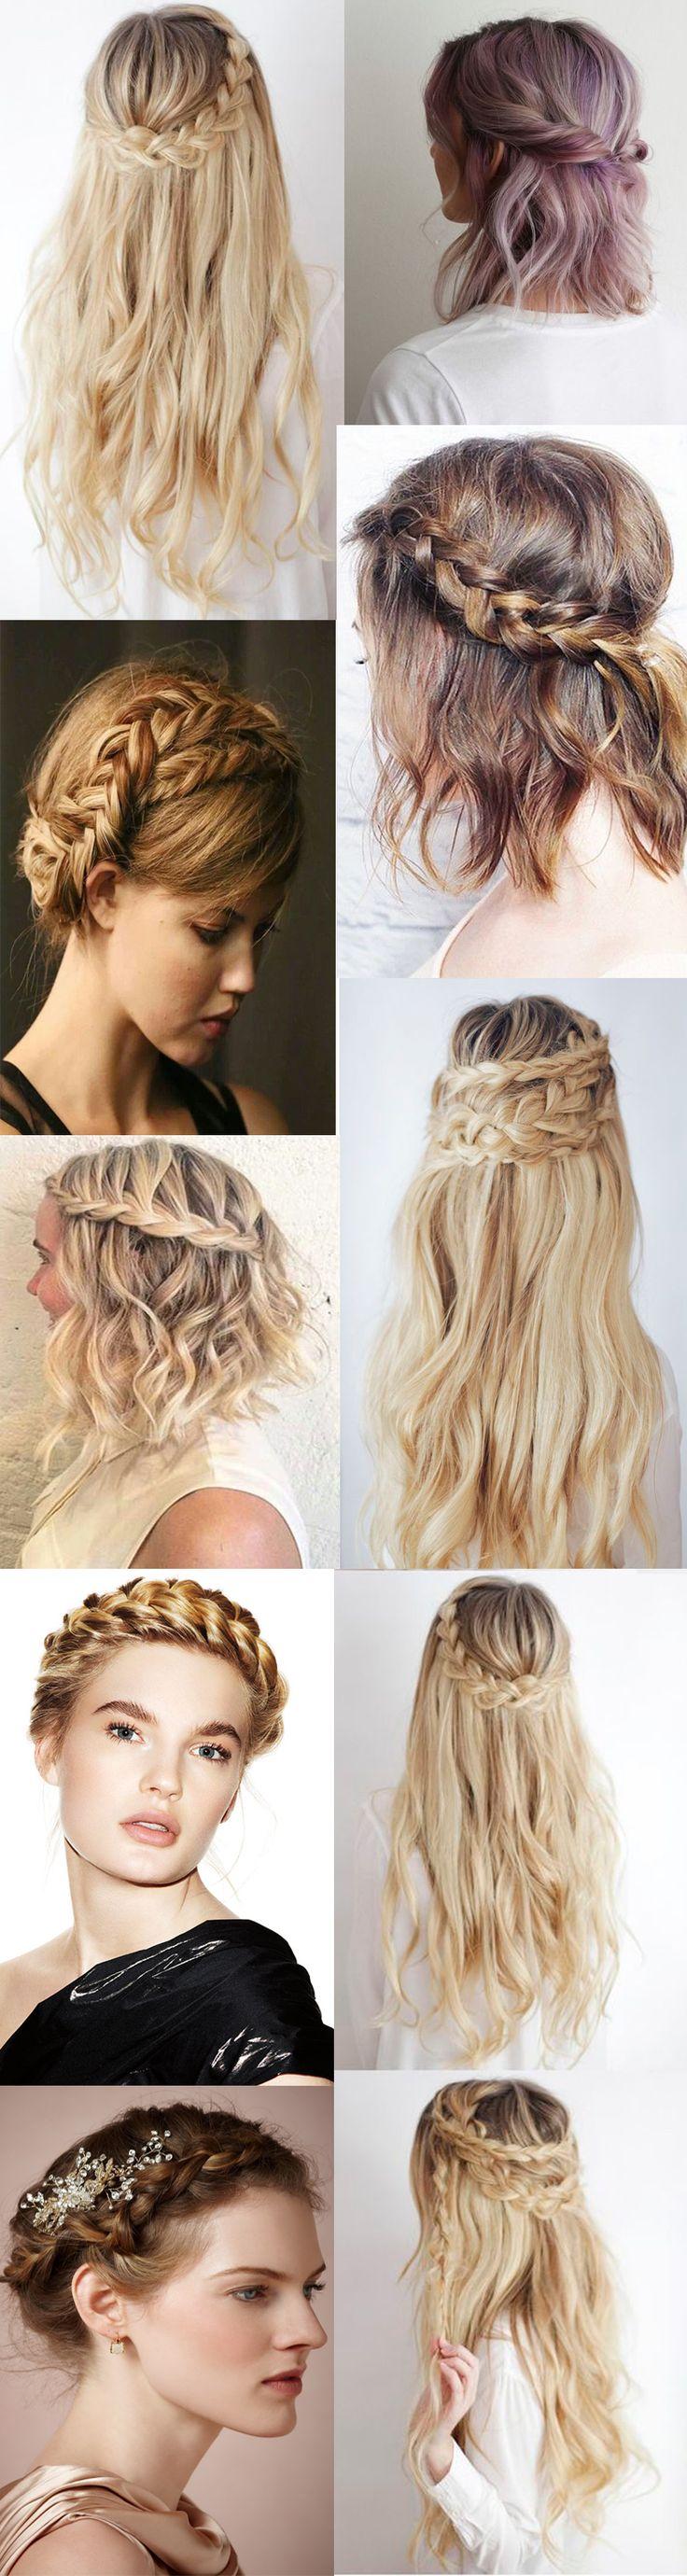 35 hairstyles for wedding long hairstyles 2016 2017 - Crown Wedding Braids Hairstyles 2016 2017 Summer Spring